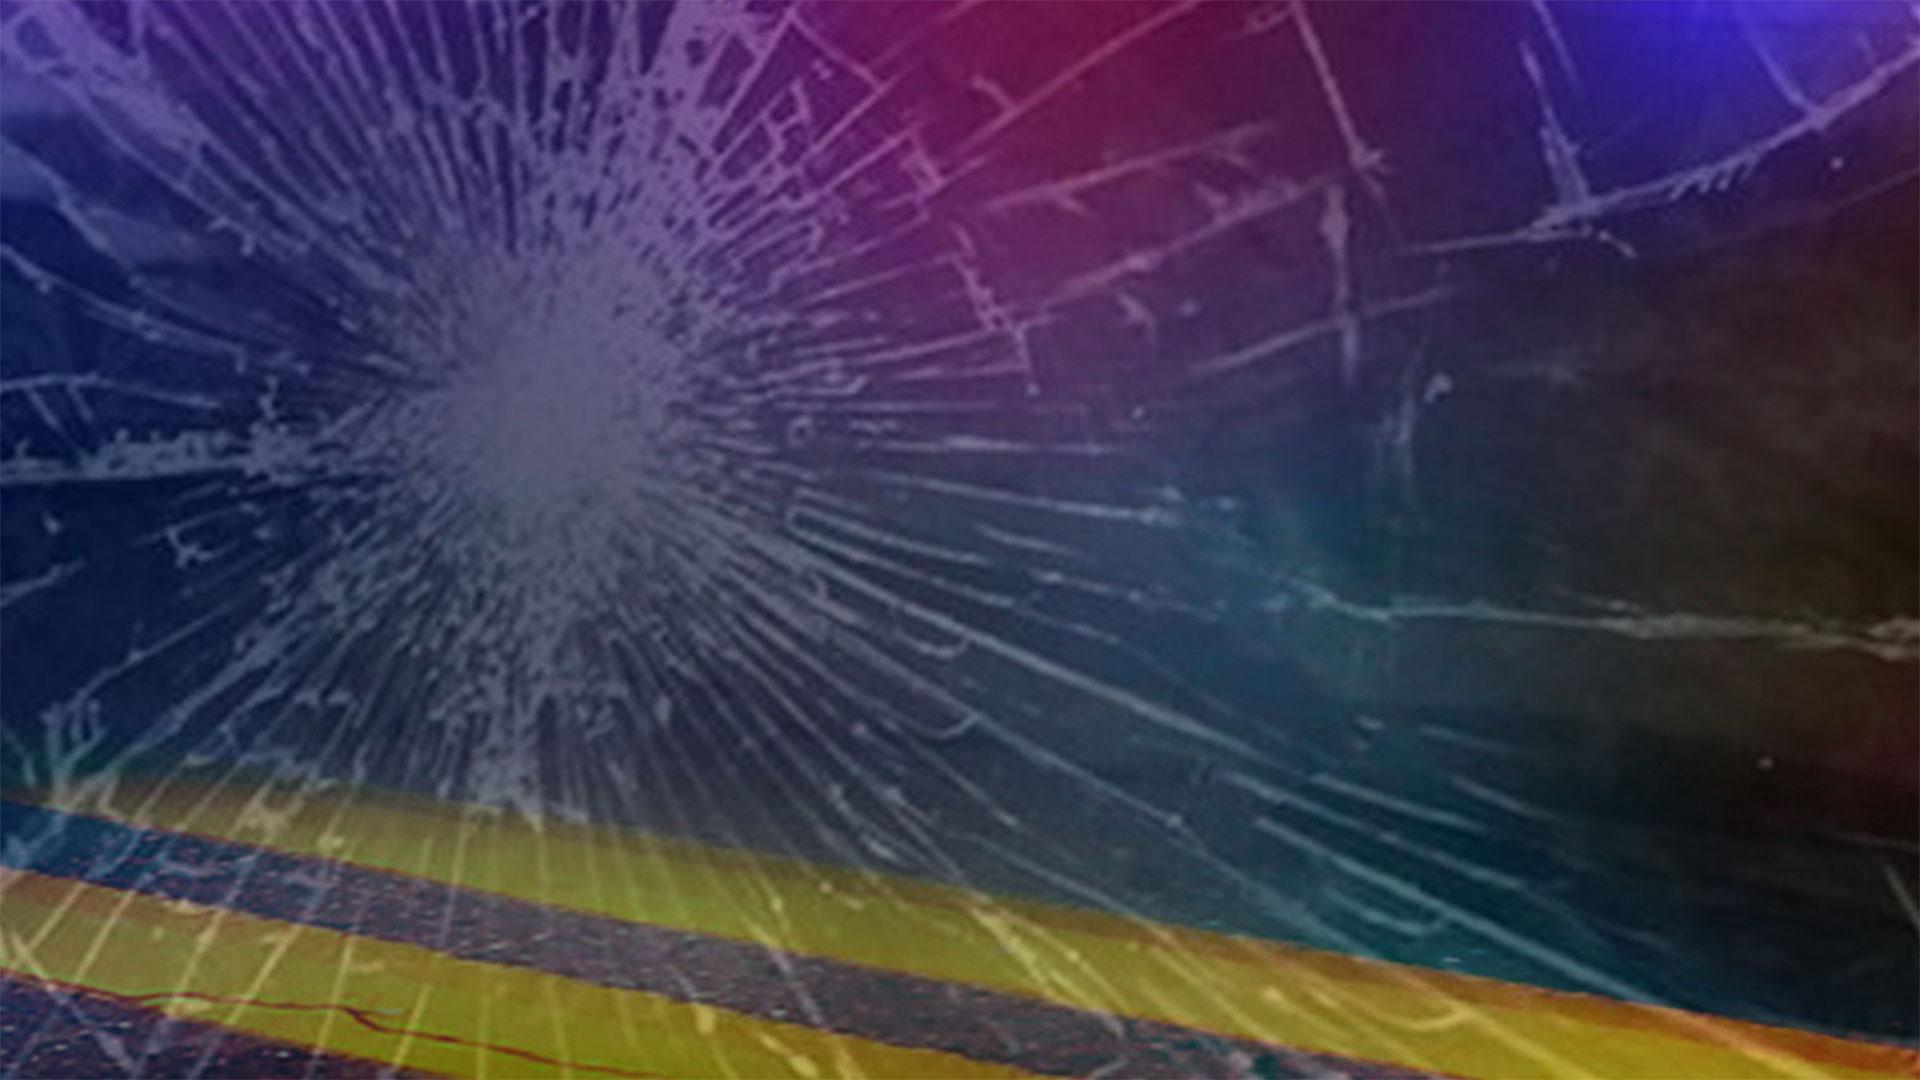 KELO Crash generic highway emergency lights